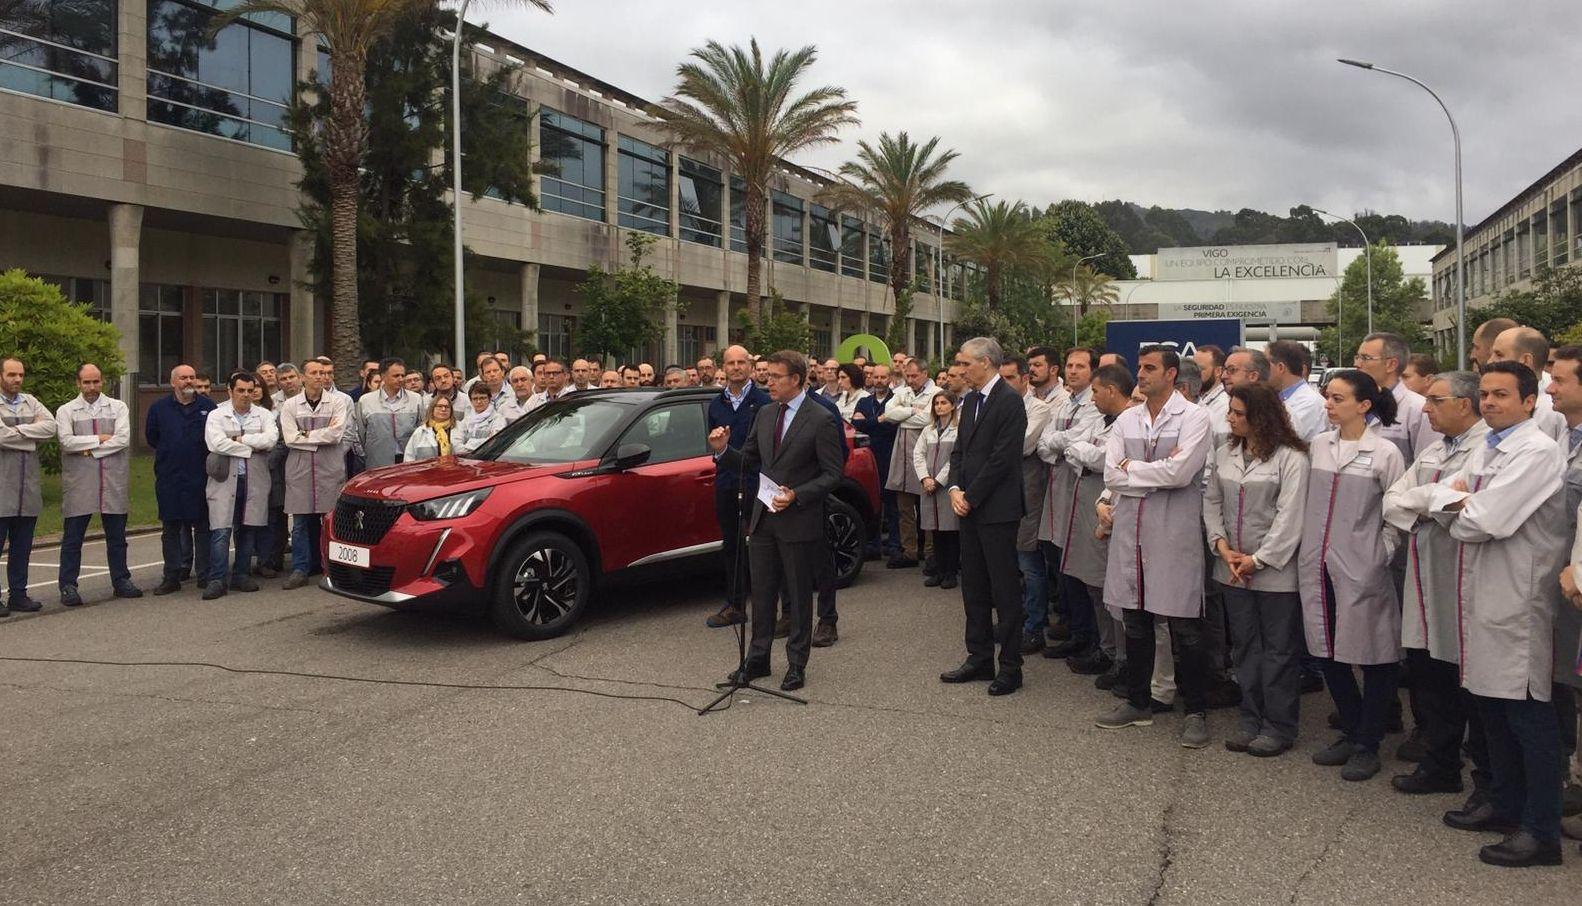 El Peugeot 2008, la nueva estrella de PSA Vigo